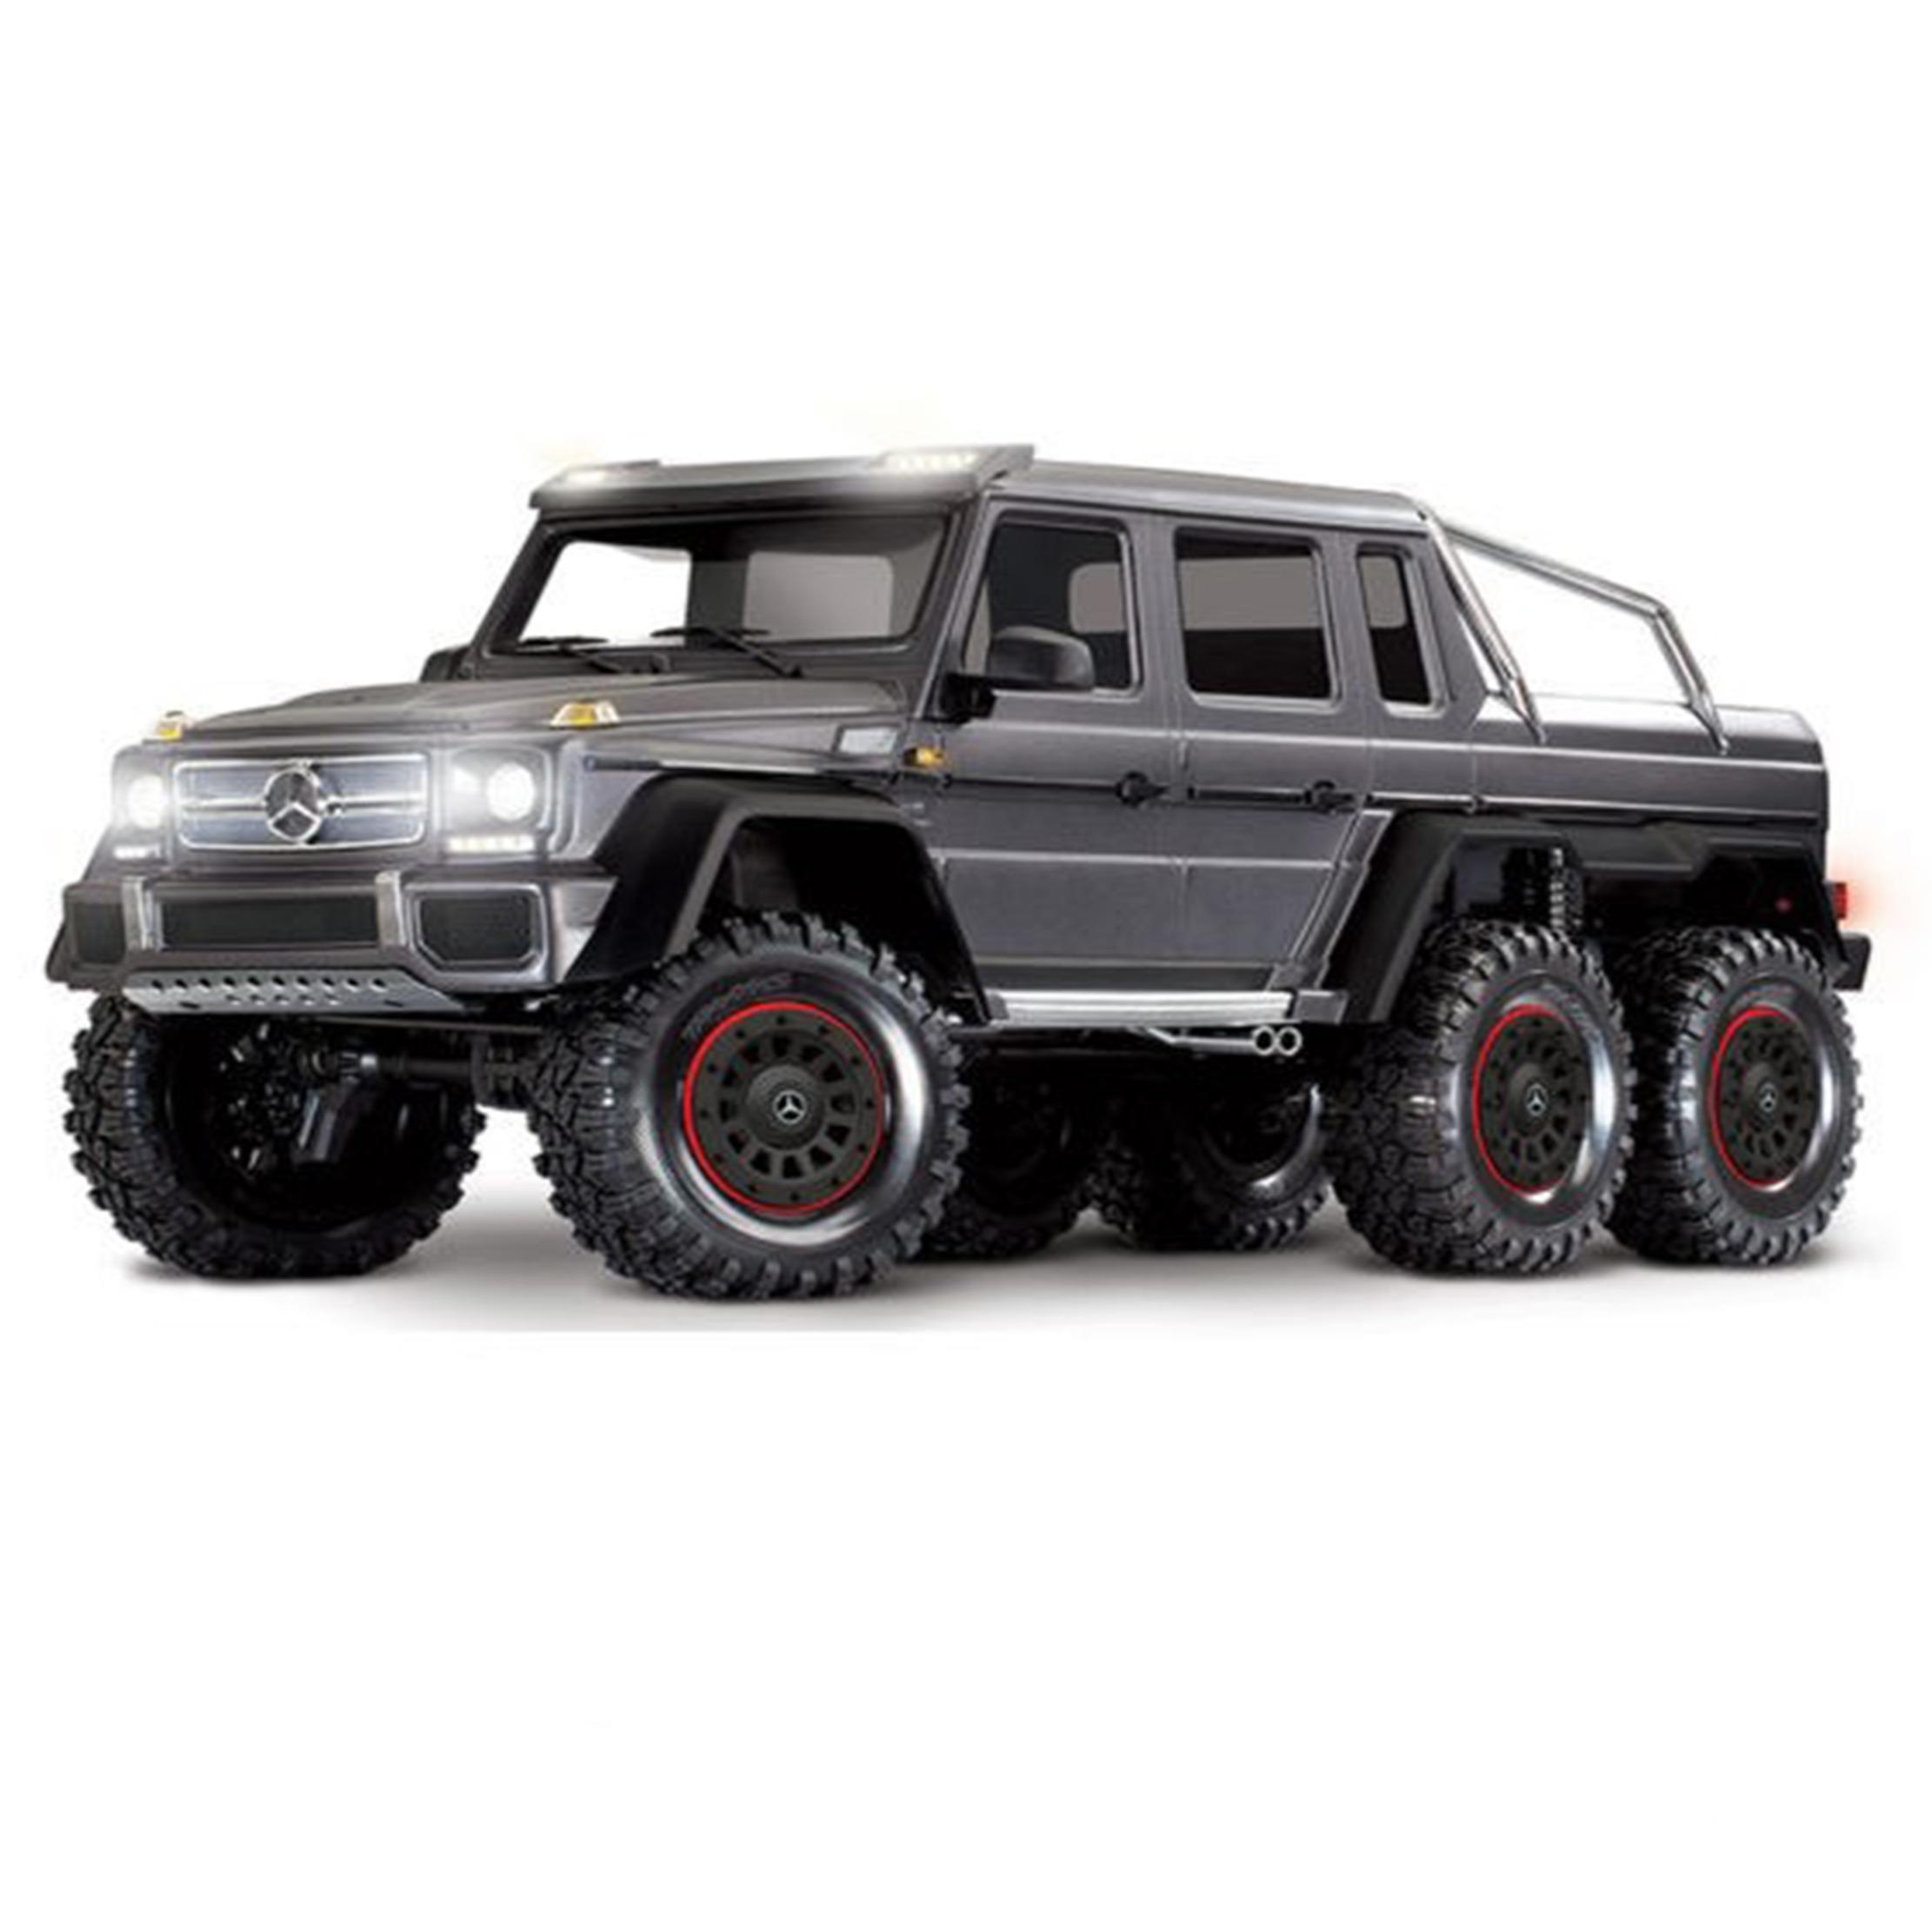 Traxxas TRX-6 Mercedes-Benz G 63 AMG Body 6X6 Electric Trail Truck Plata